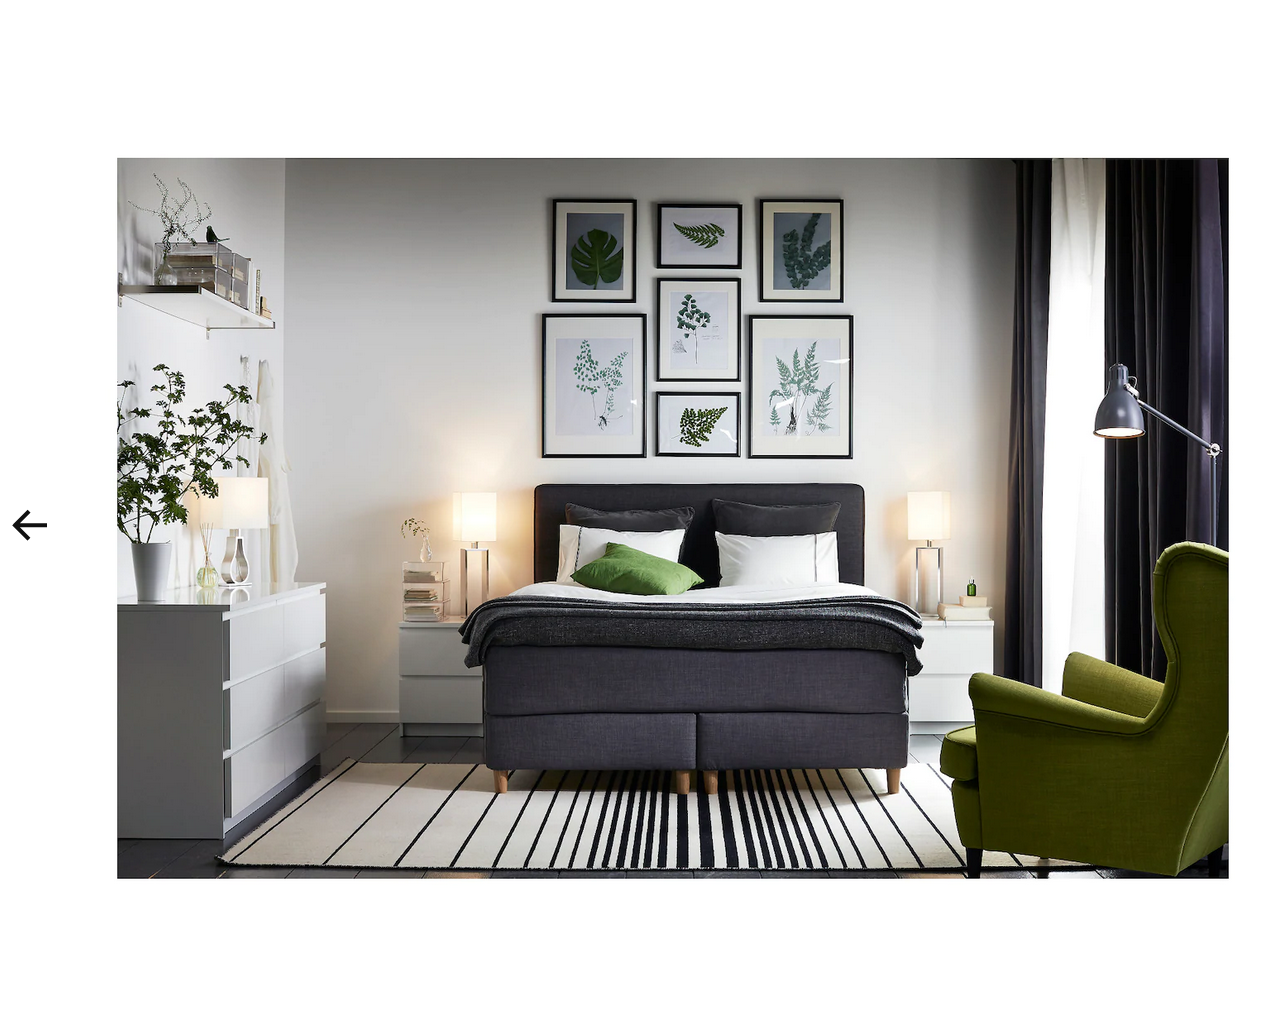 Ikea Nordli Chest Of 2 Drawers White 090 211 64 For Sale Online Ebay